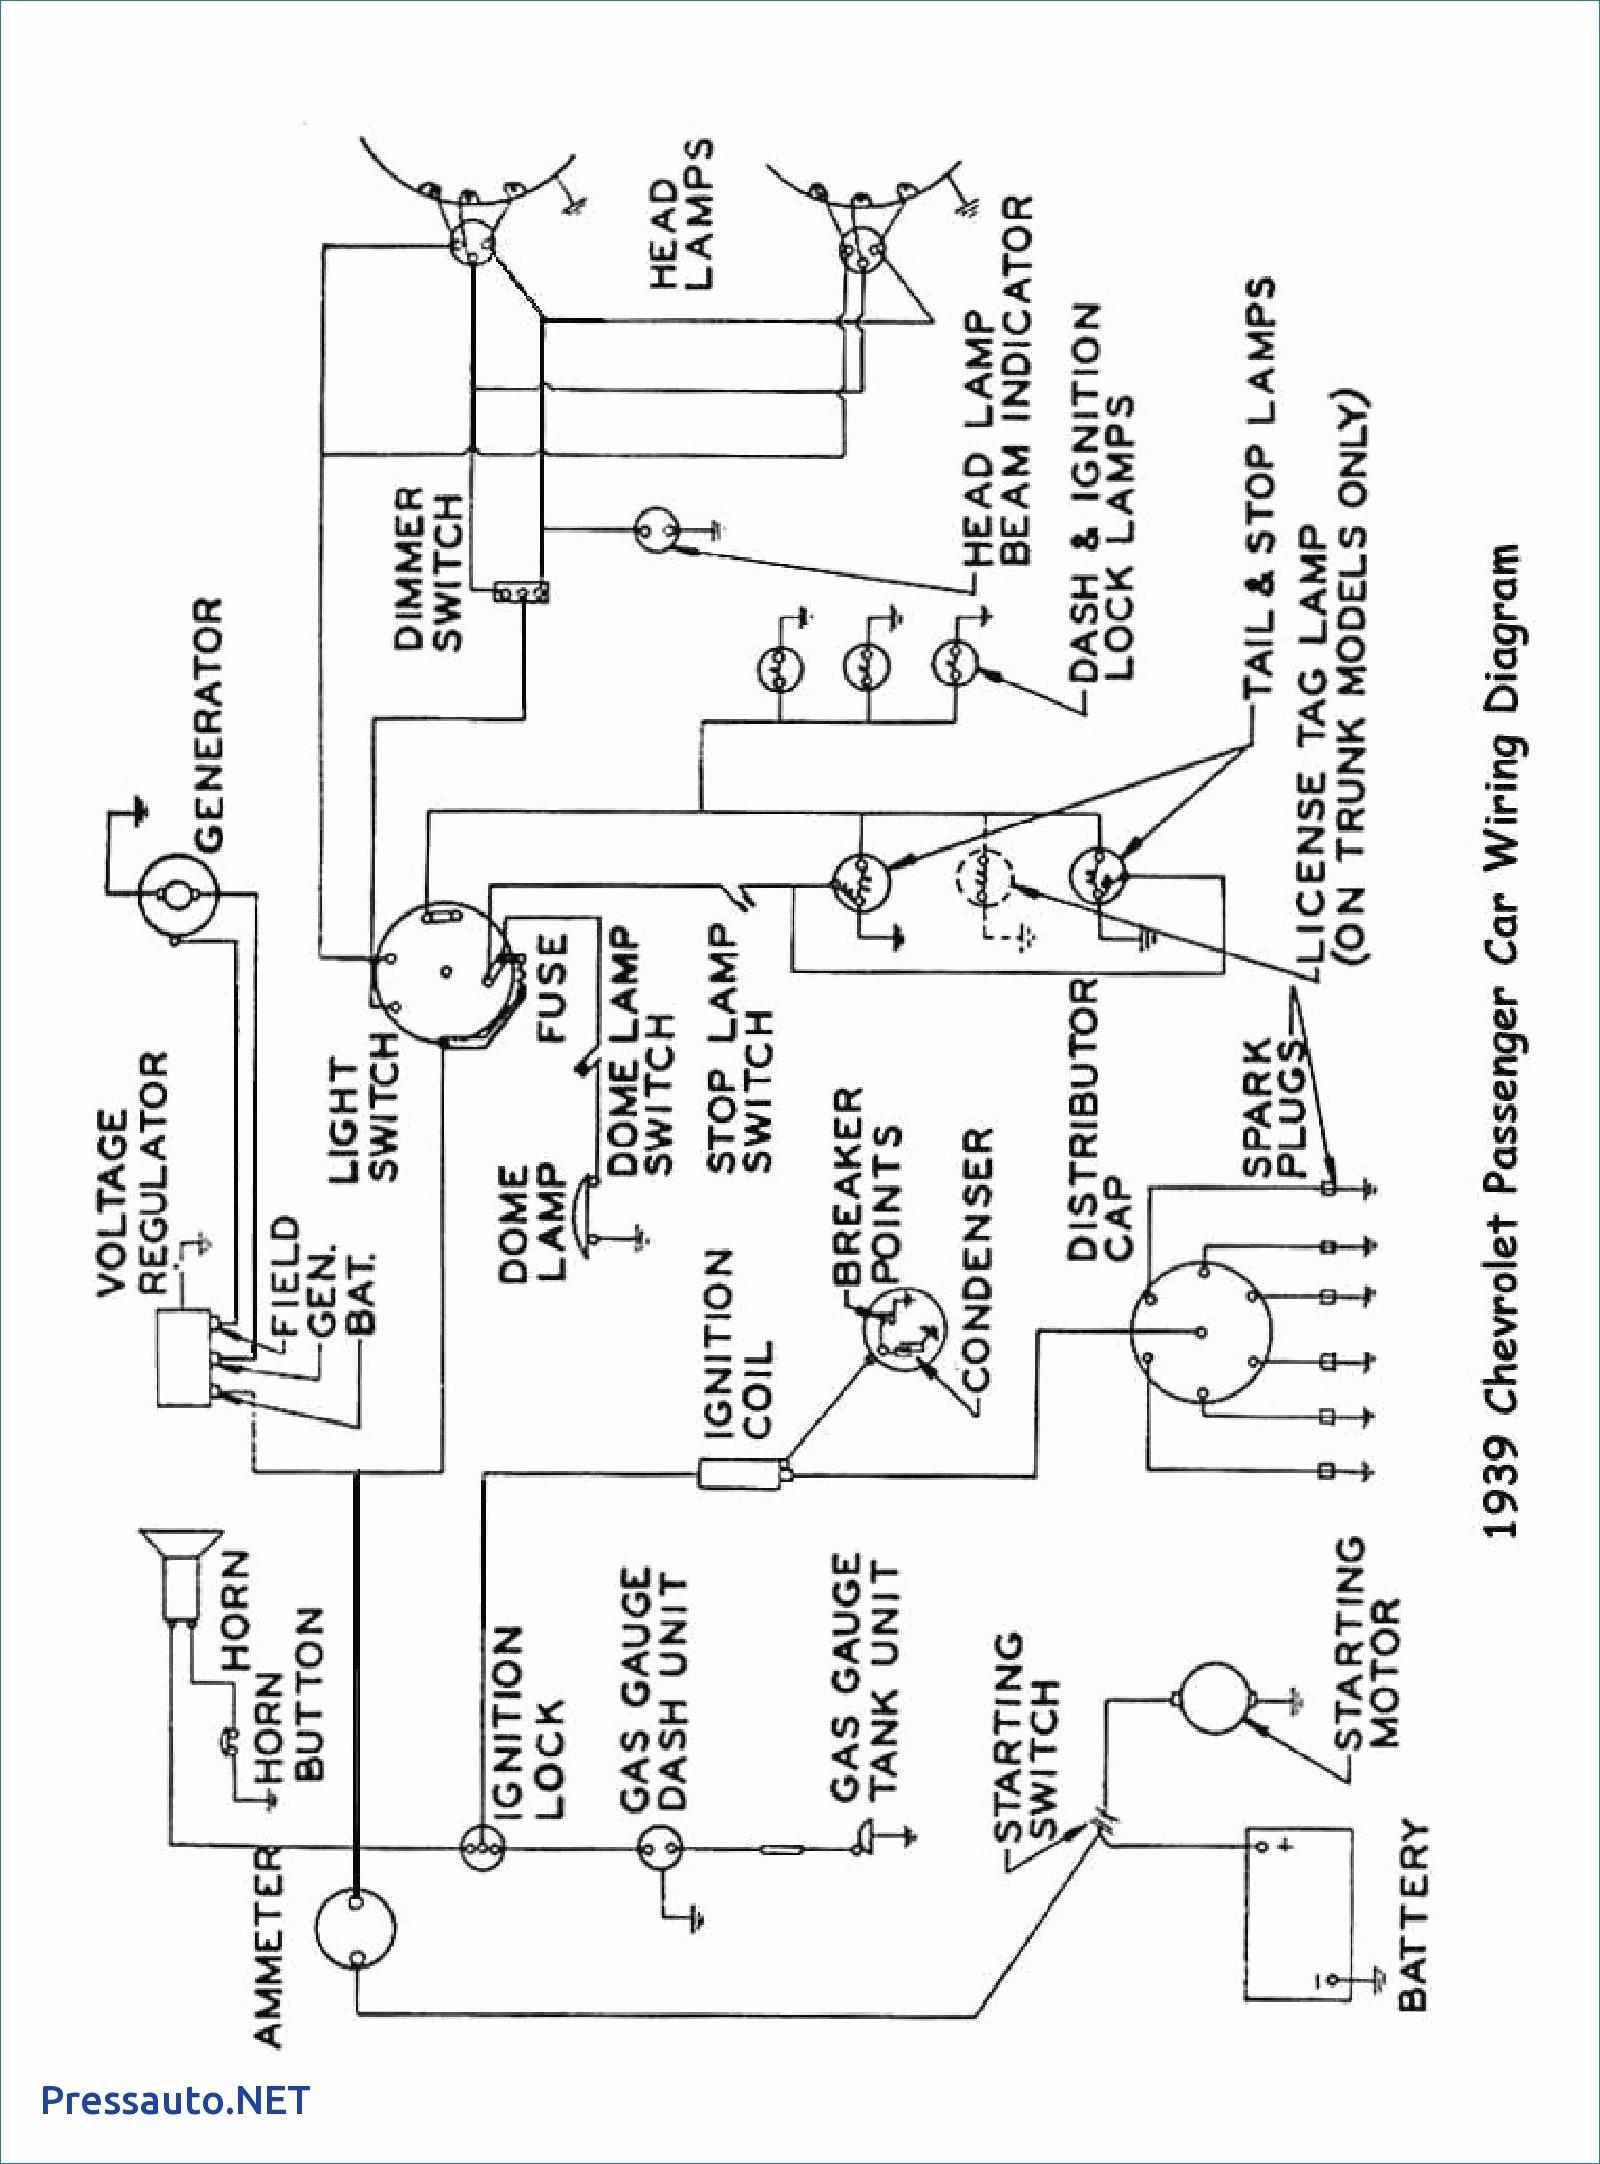 International 4700 Wiring Diagram Headlights | Wiring Library - International 4700 Wiring Diagram Pdf